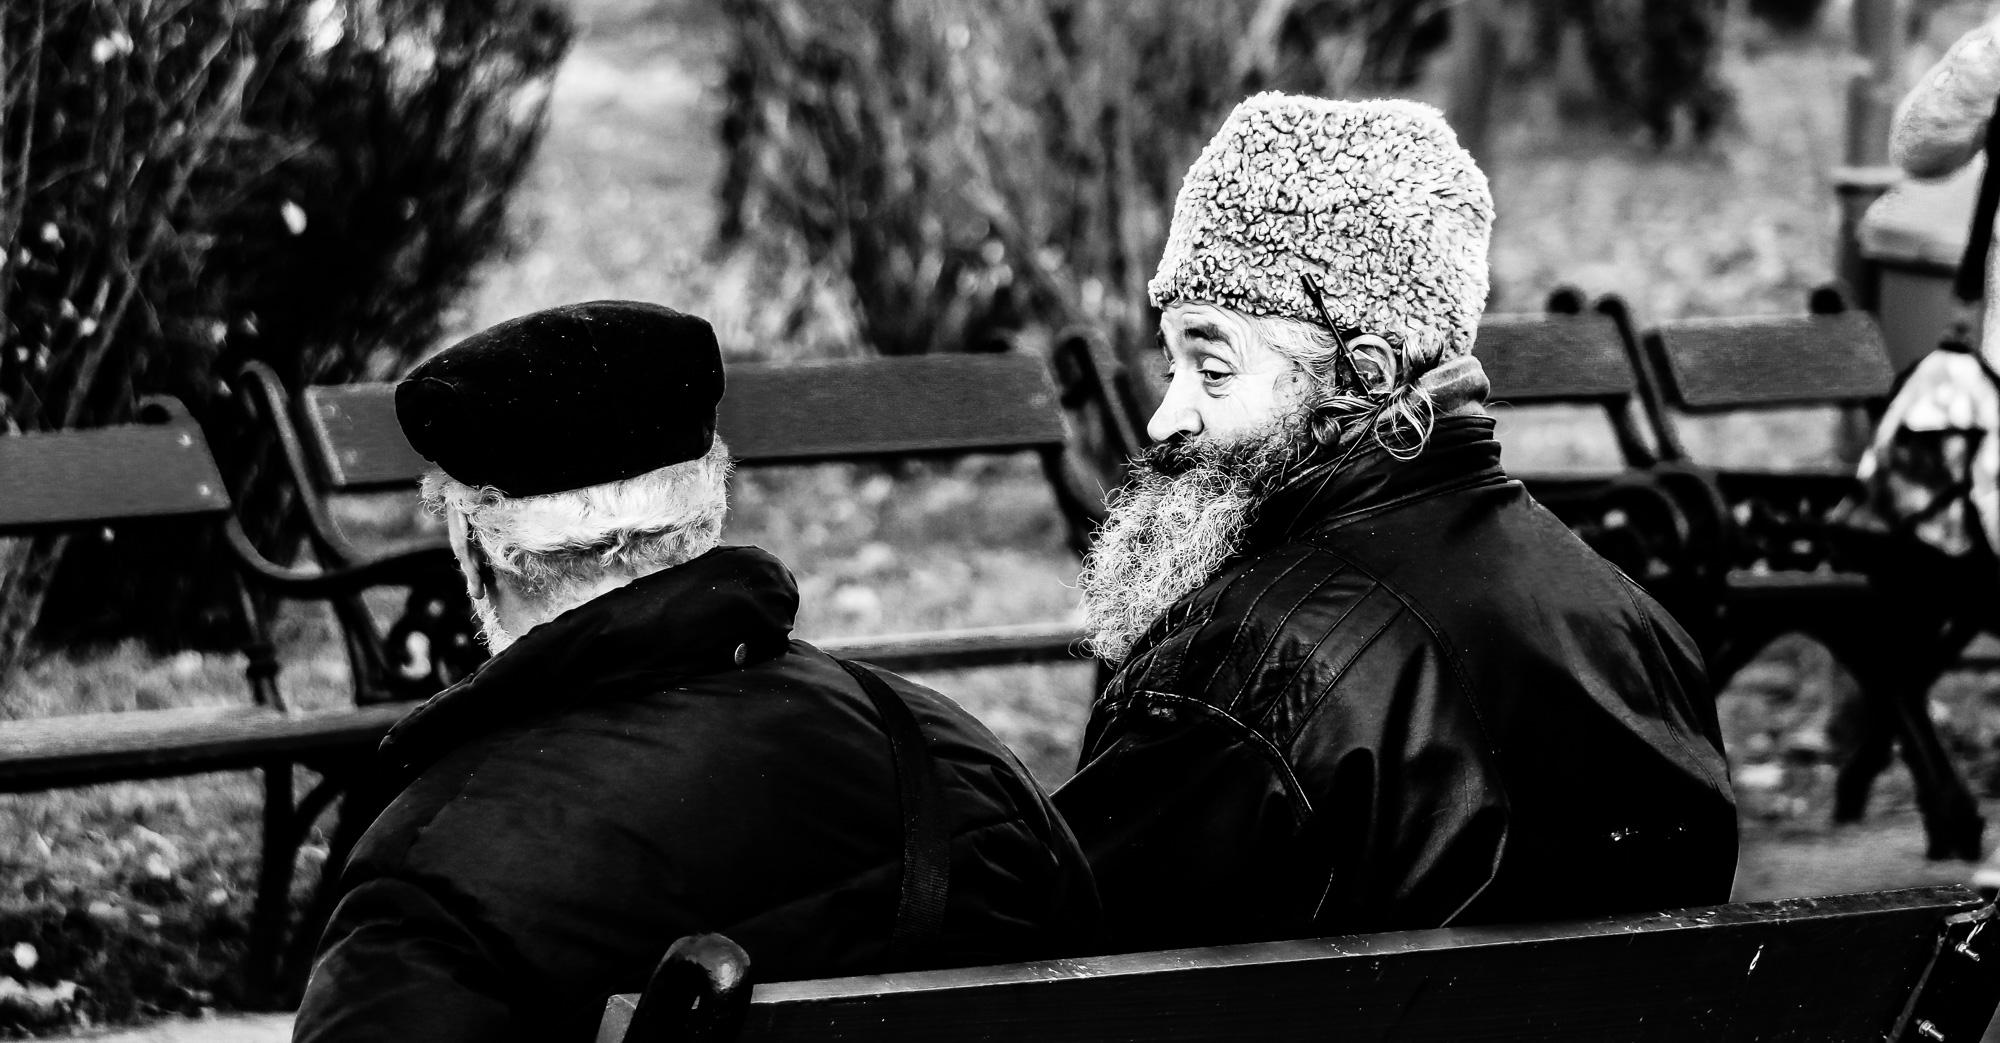 homeless-poznan-europe-stemajourneys.com.jpg